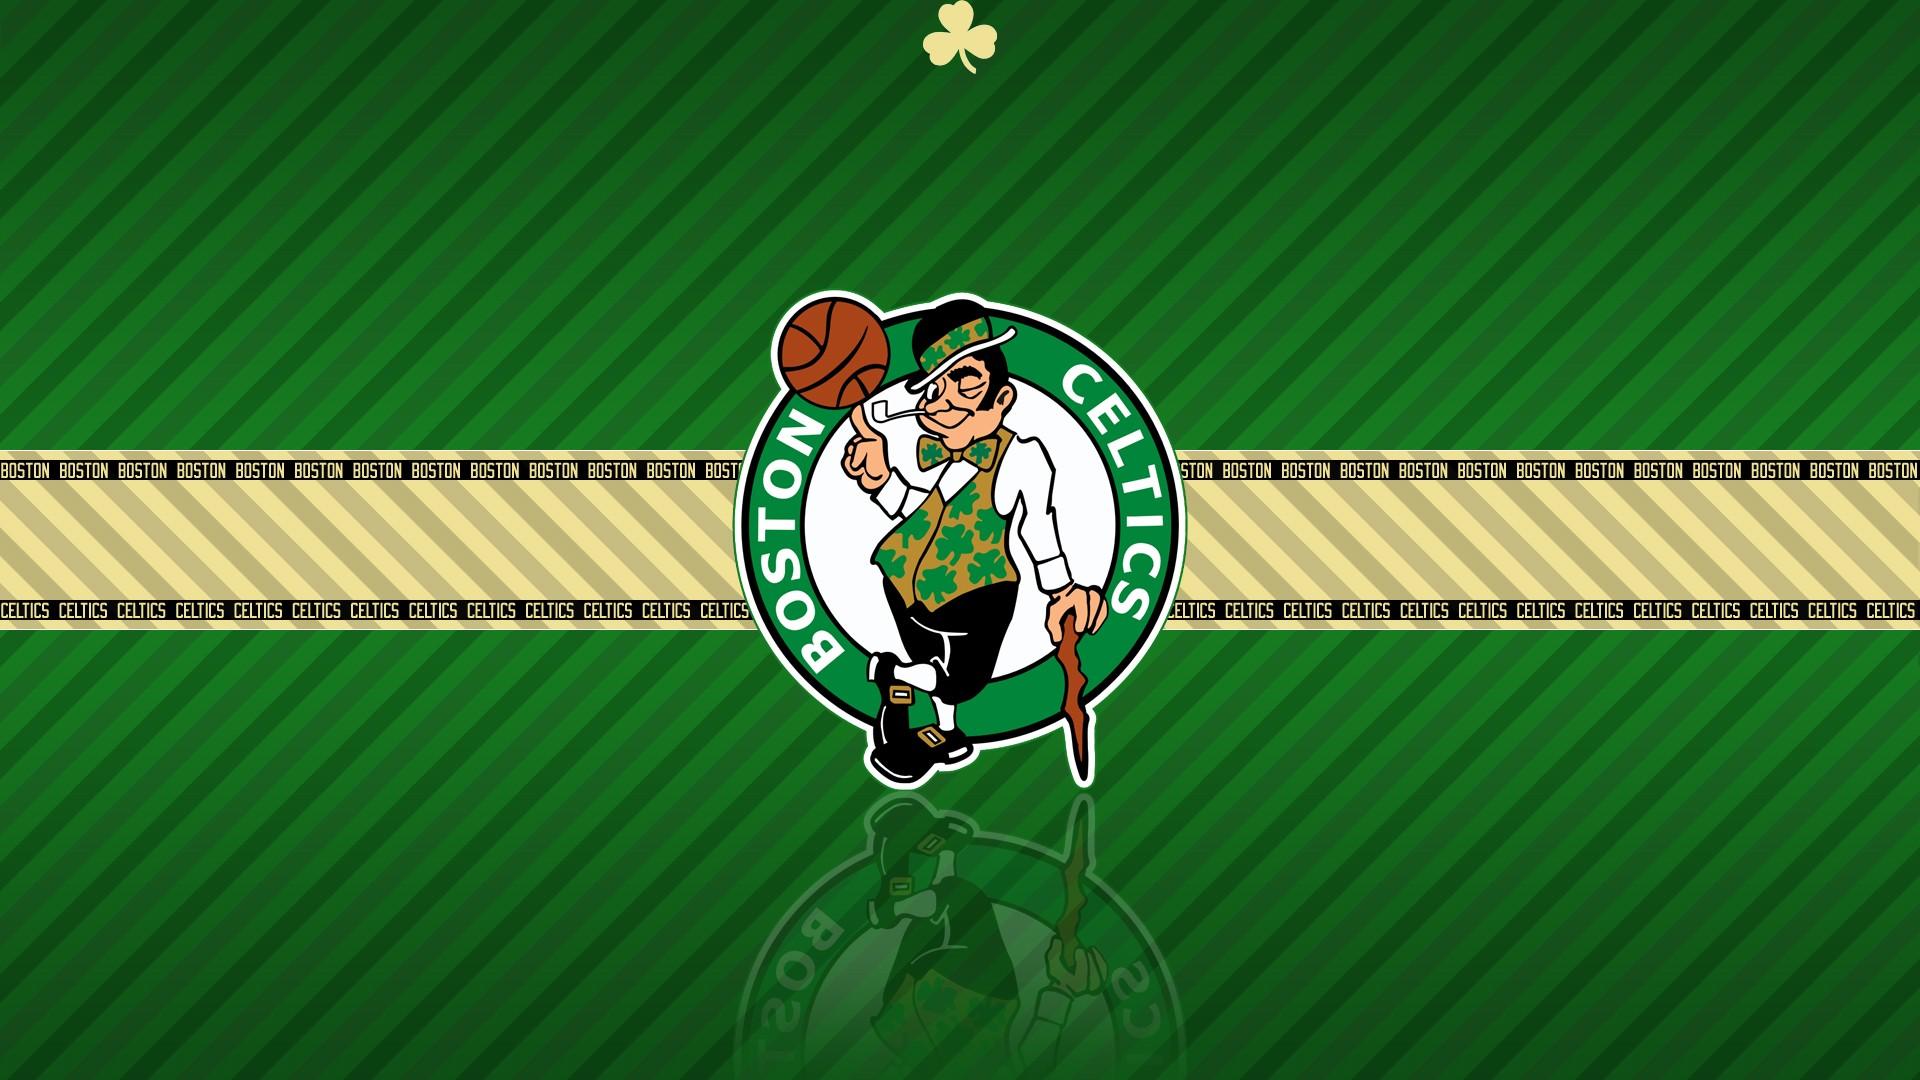 Boston Celtics Computer Wallpapers Desktop Backgrounds 1920x1080 1920x1080